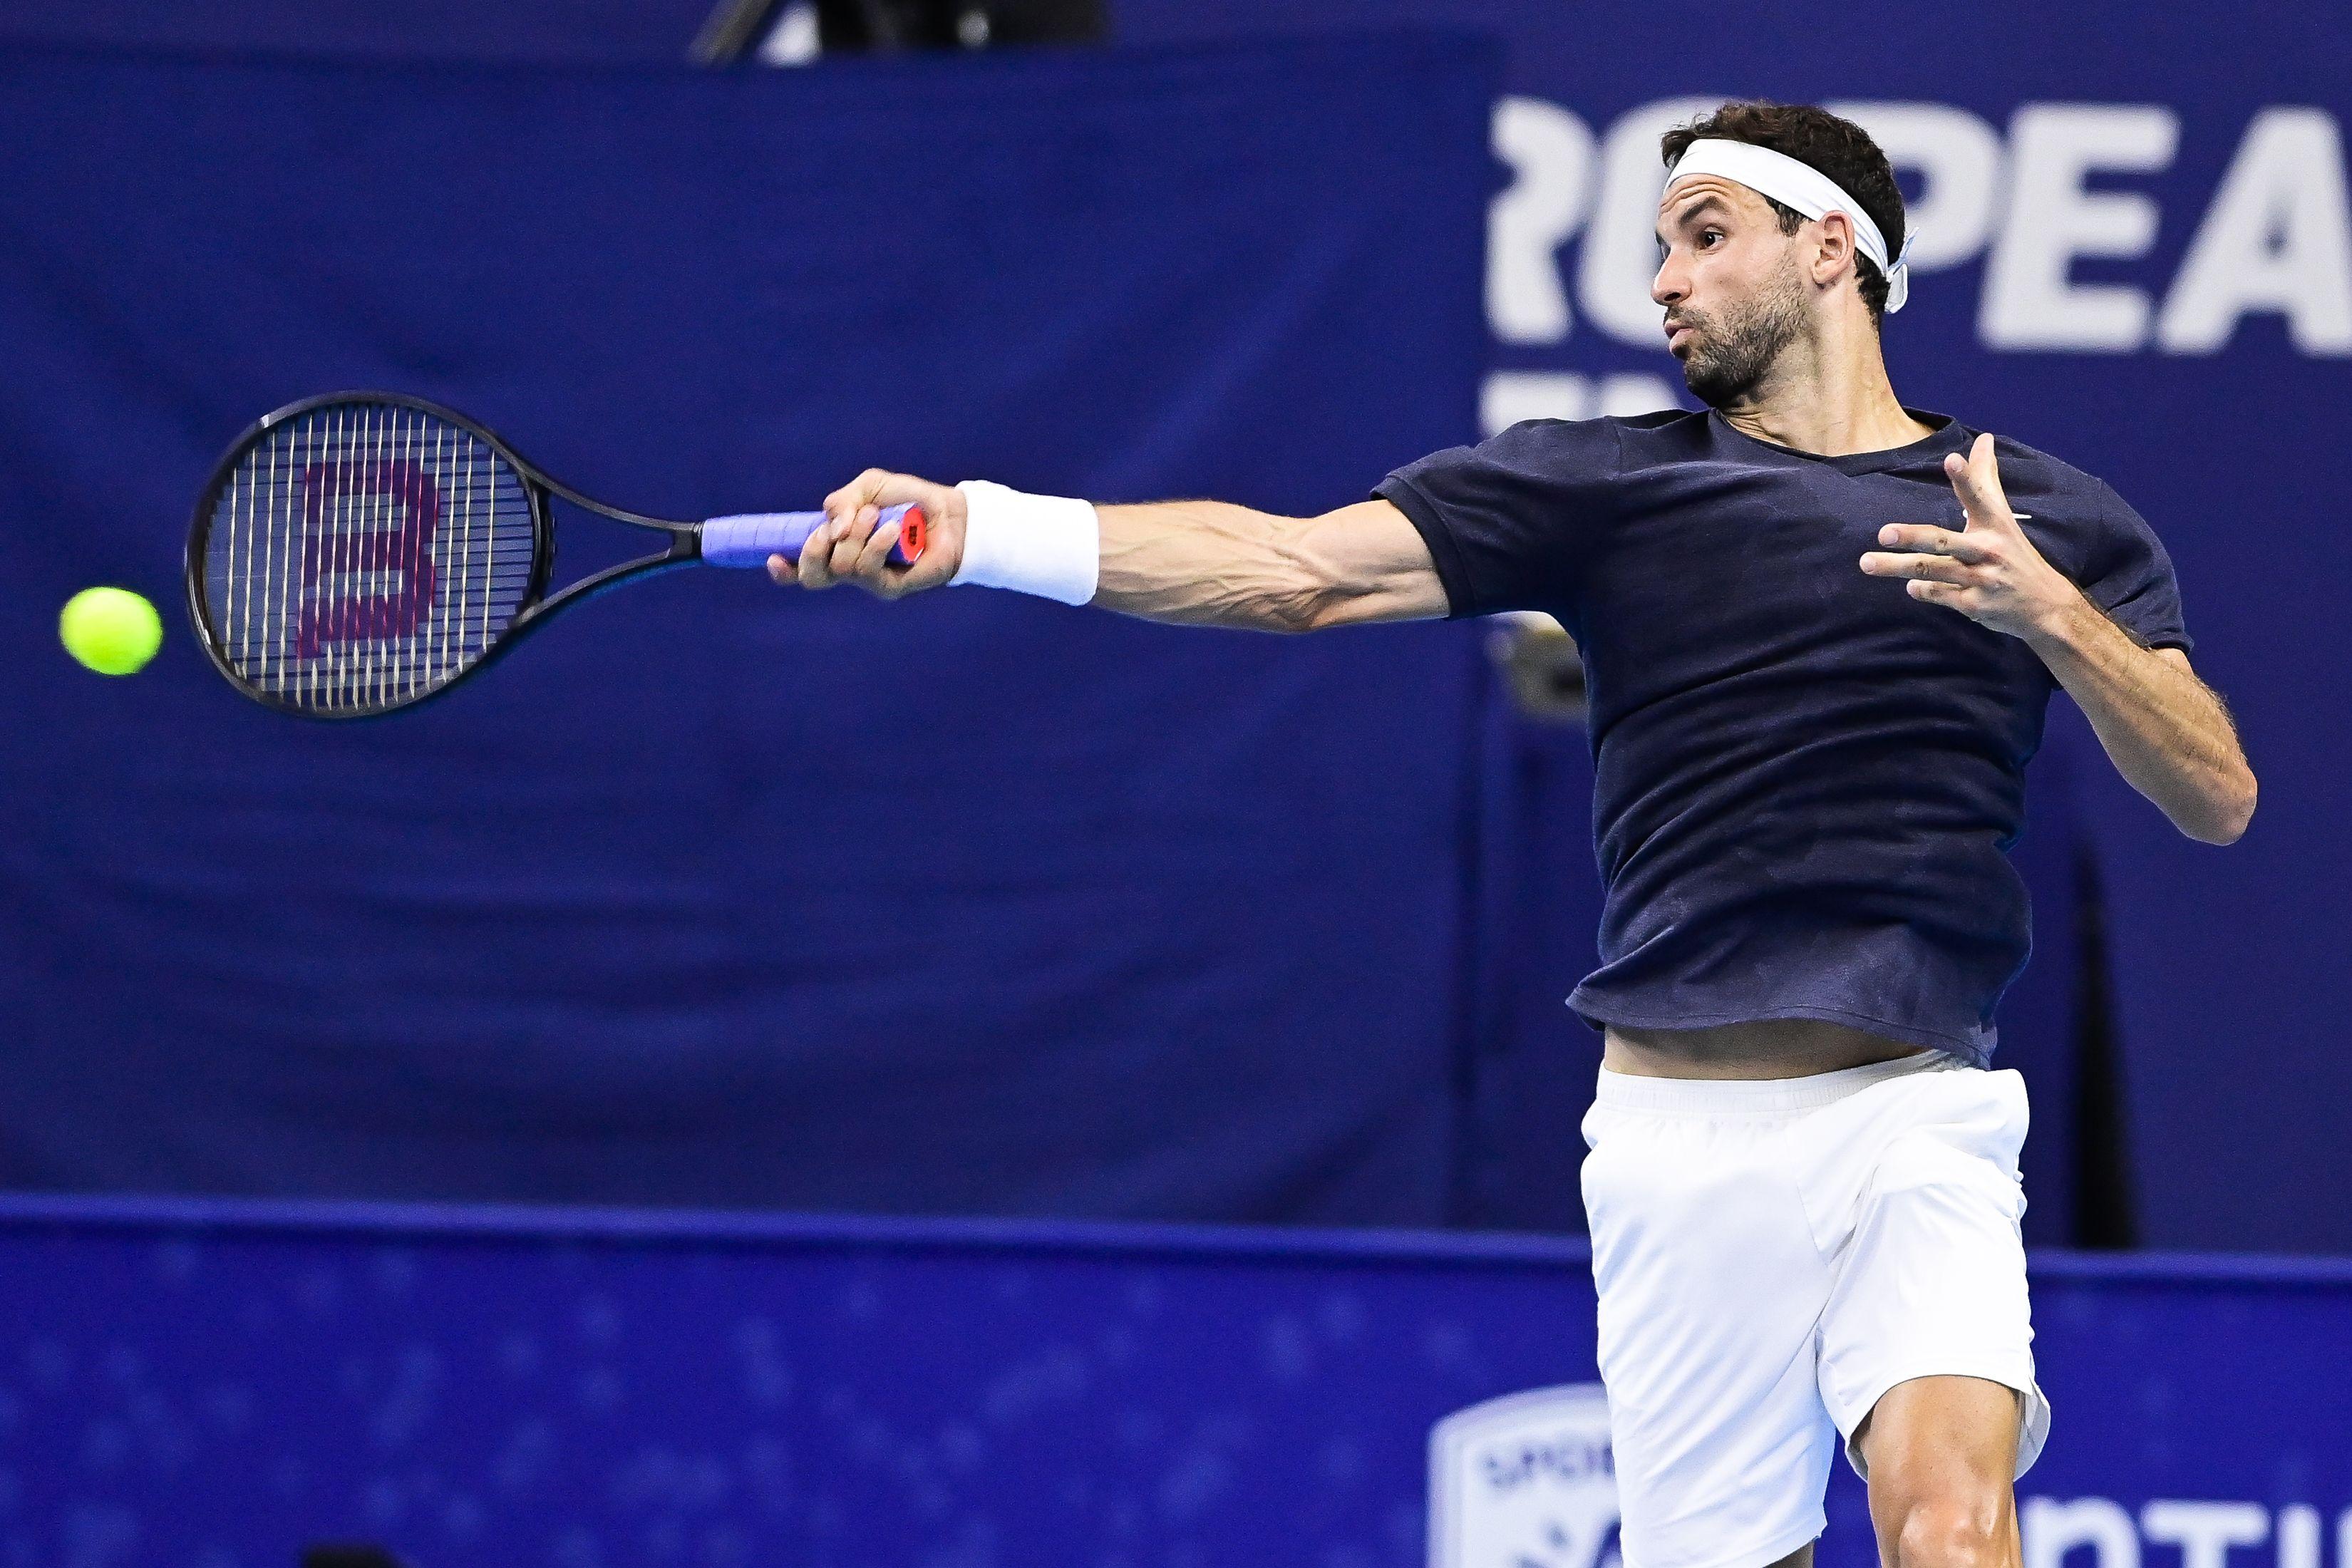 Определился соперник Карацева по четвертьфиналу Australian Open